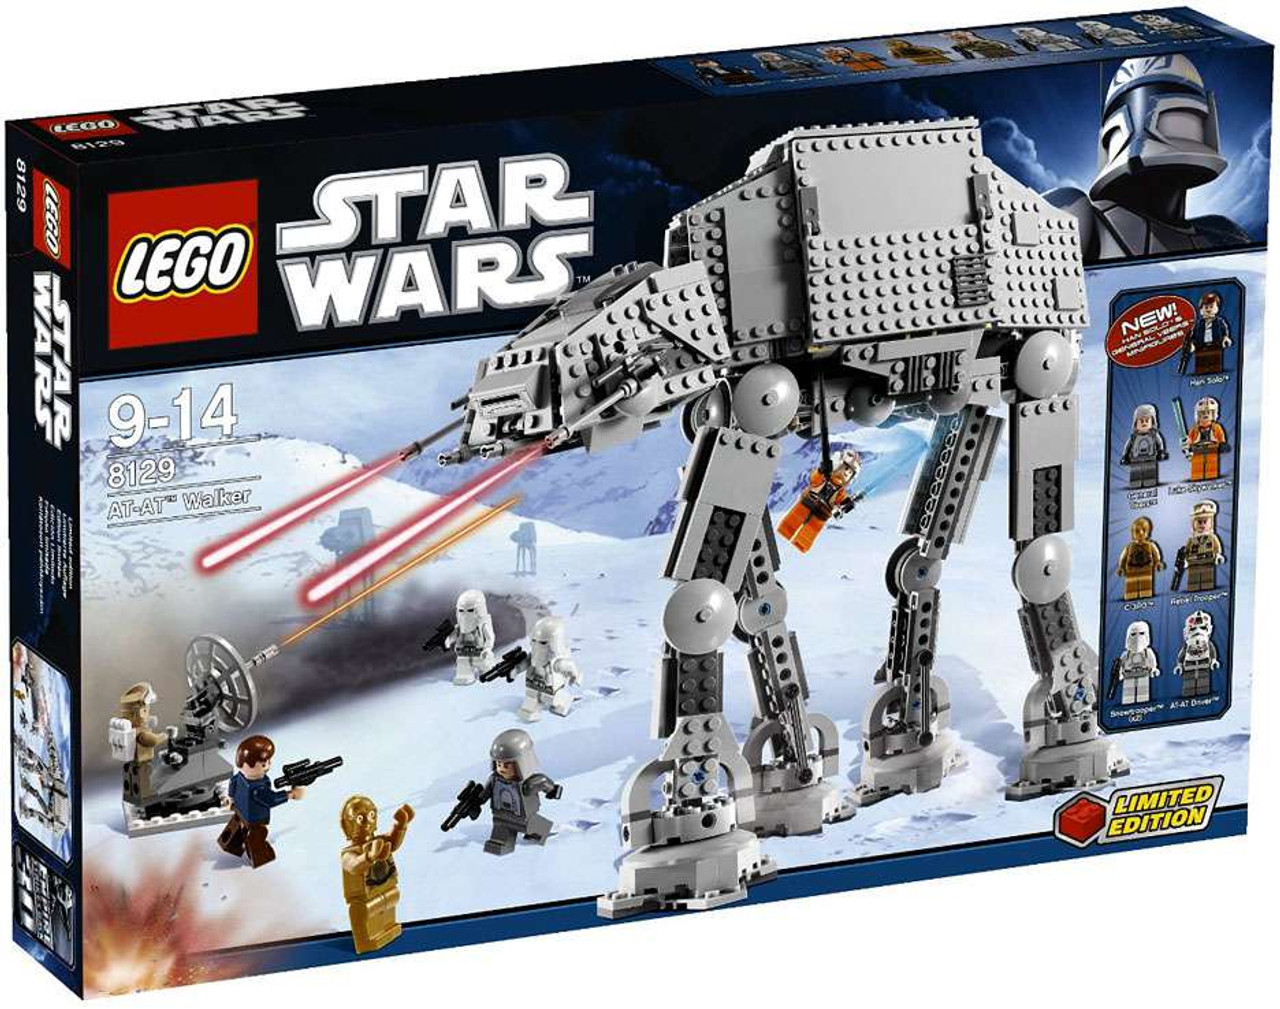 LEGO Star Wars Empire Strikes Back AT-AT Walker Set #8129